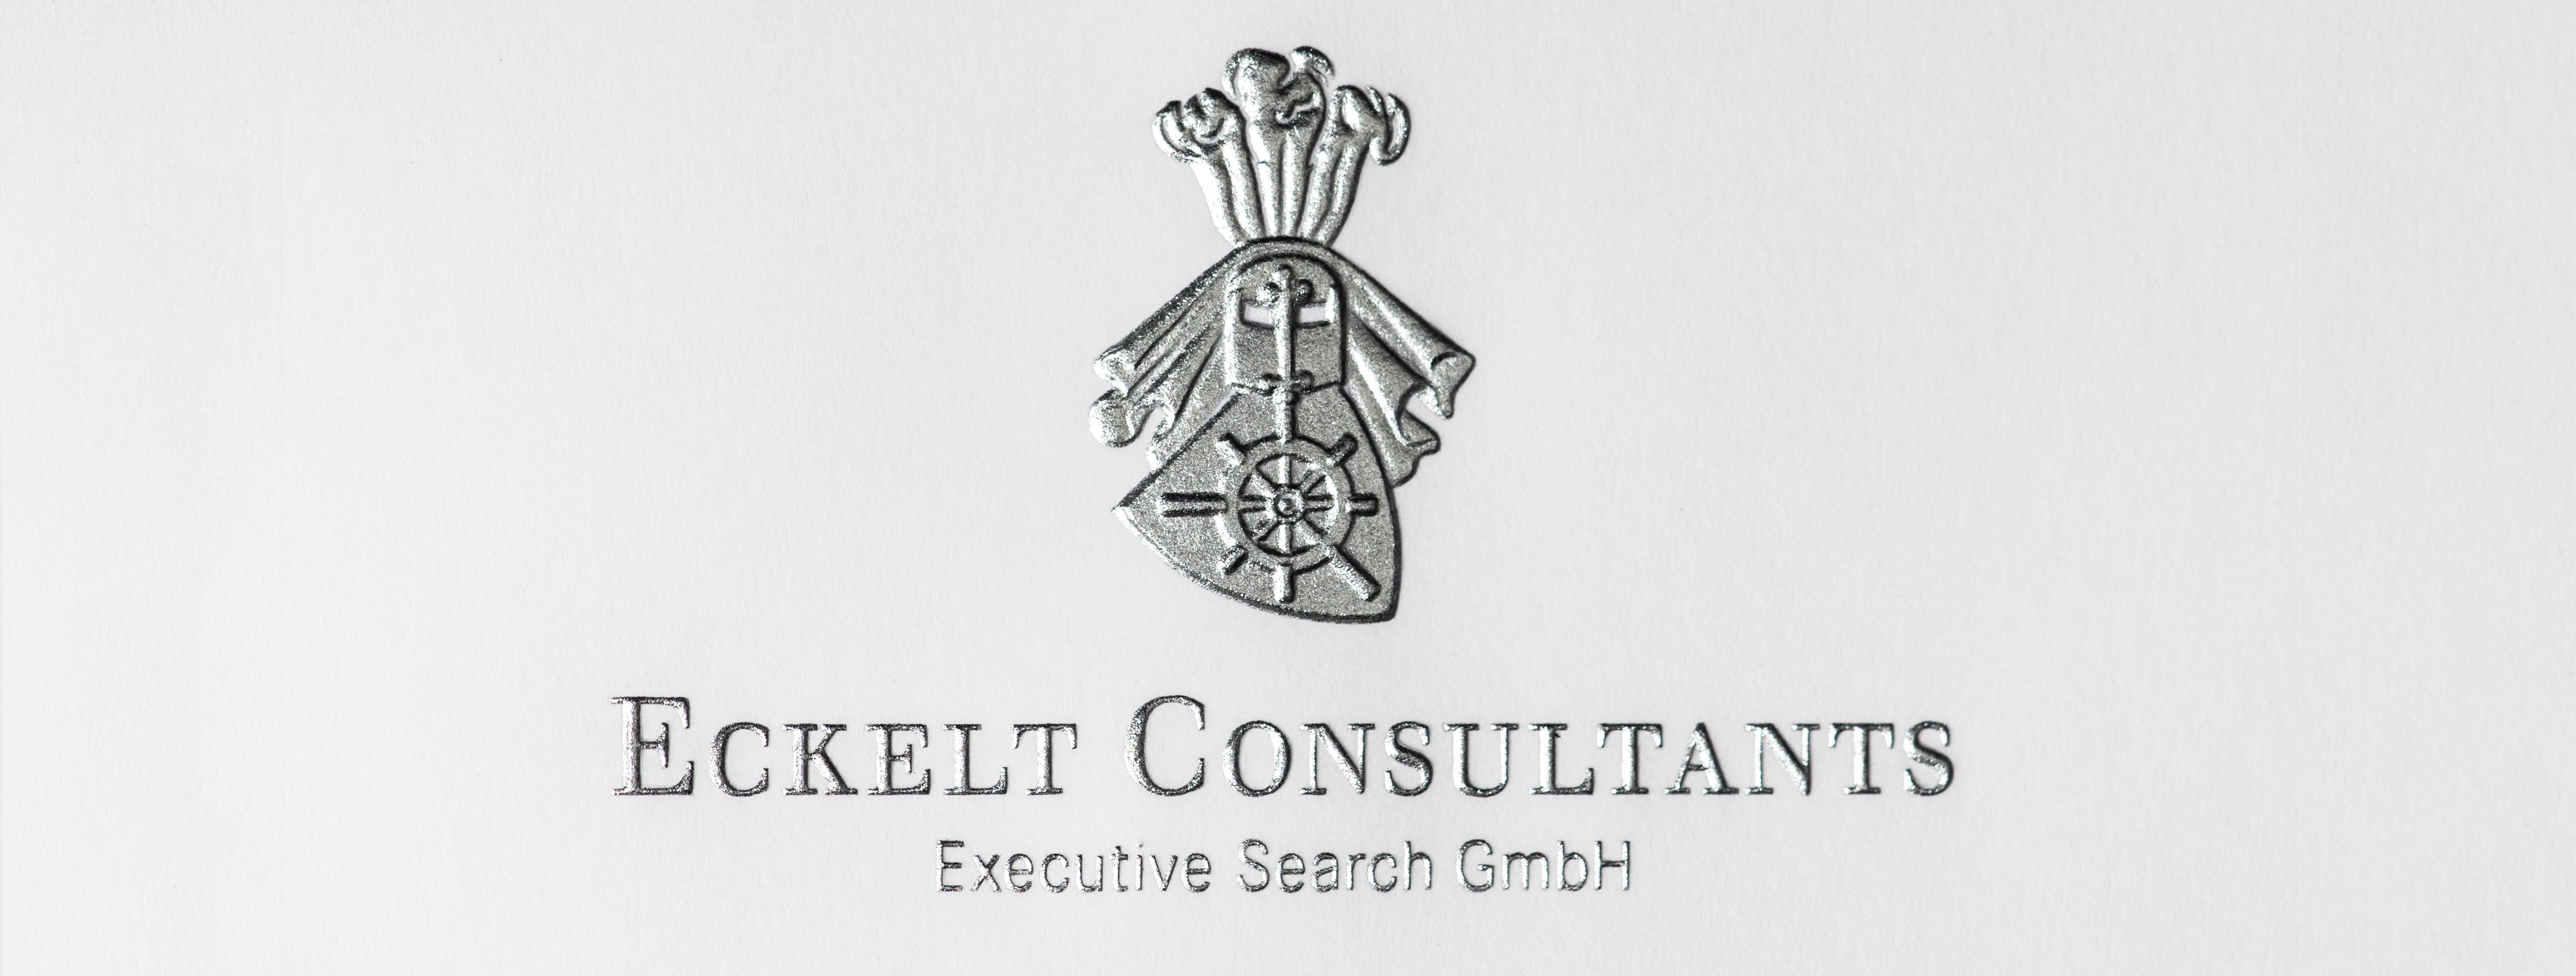 Stahlstich_WappenEckelt